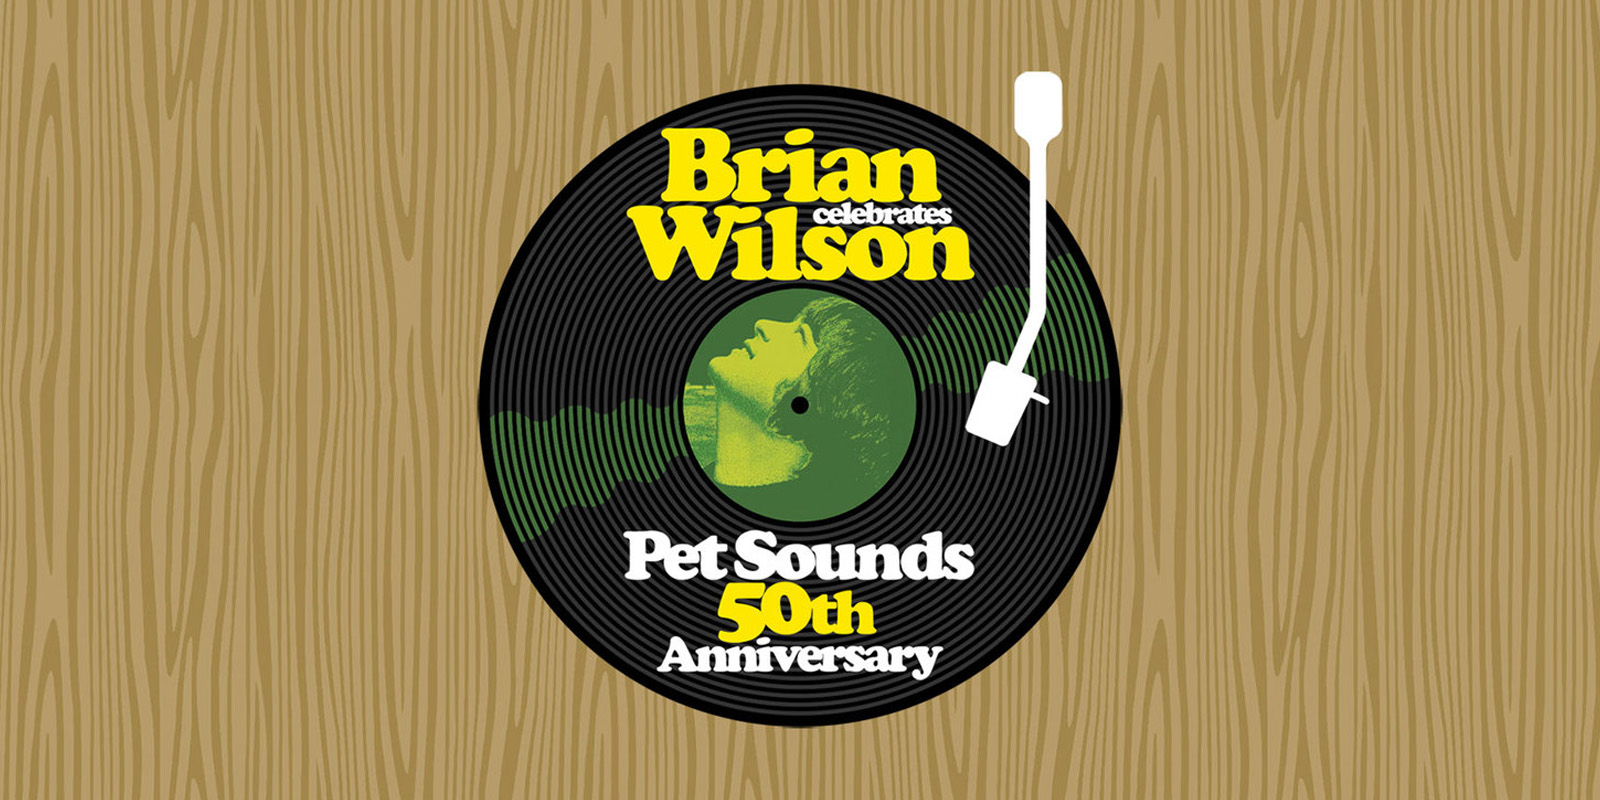 Brian Wilson - Wide.jpg